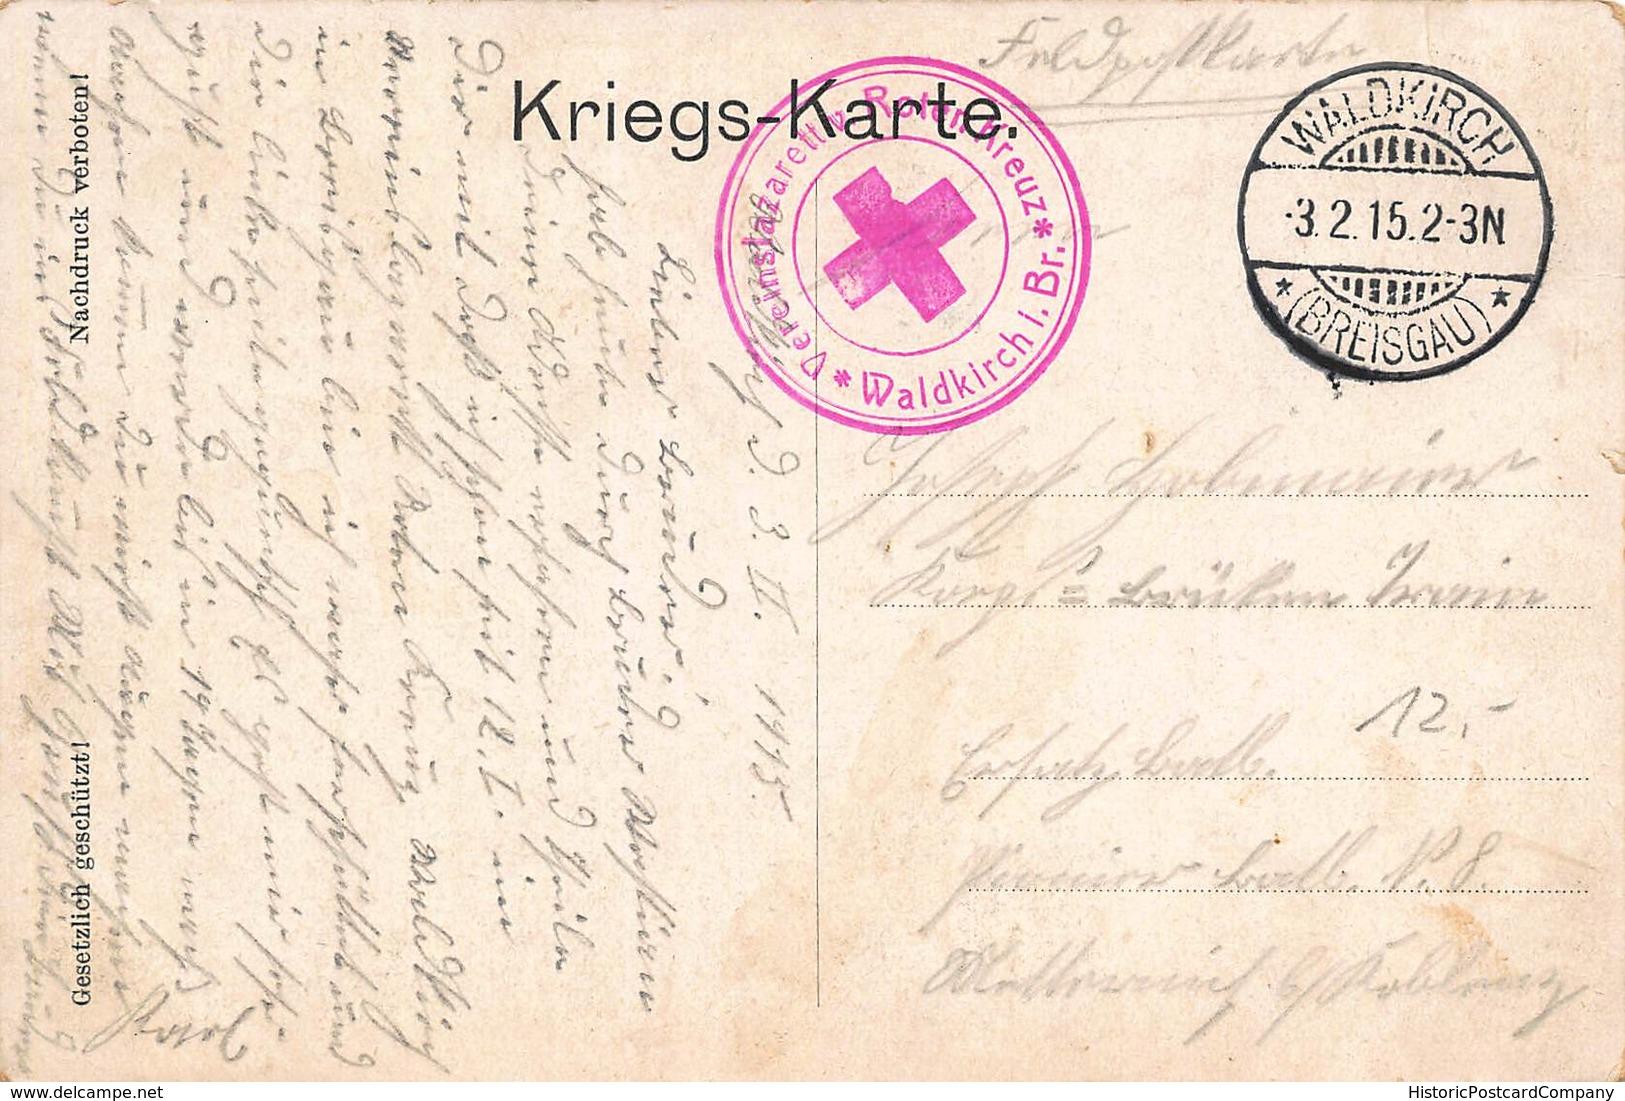 DEUTSCHES REICH-KAISER WILHELM II-KIAUTSCHAU-TSINGTAU-KOLONIE-CHINA-1915 WW1 FELDPOST POSTCARD 40467 - War 1914-18